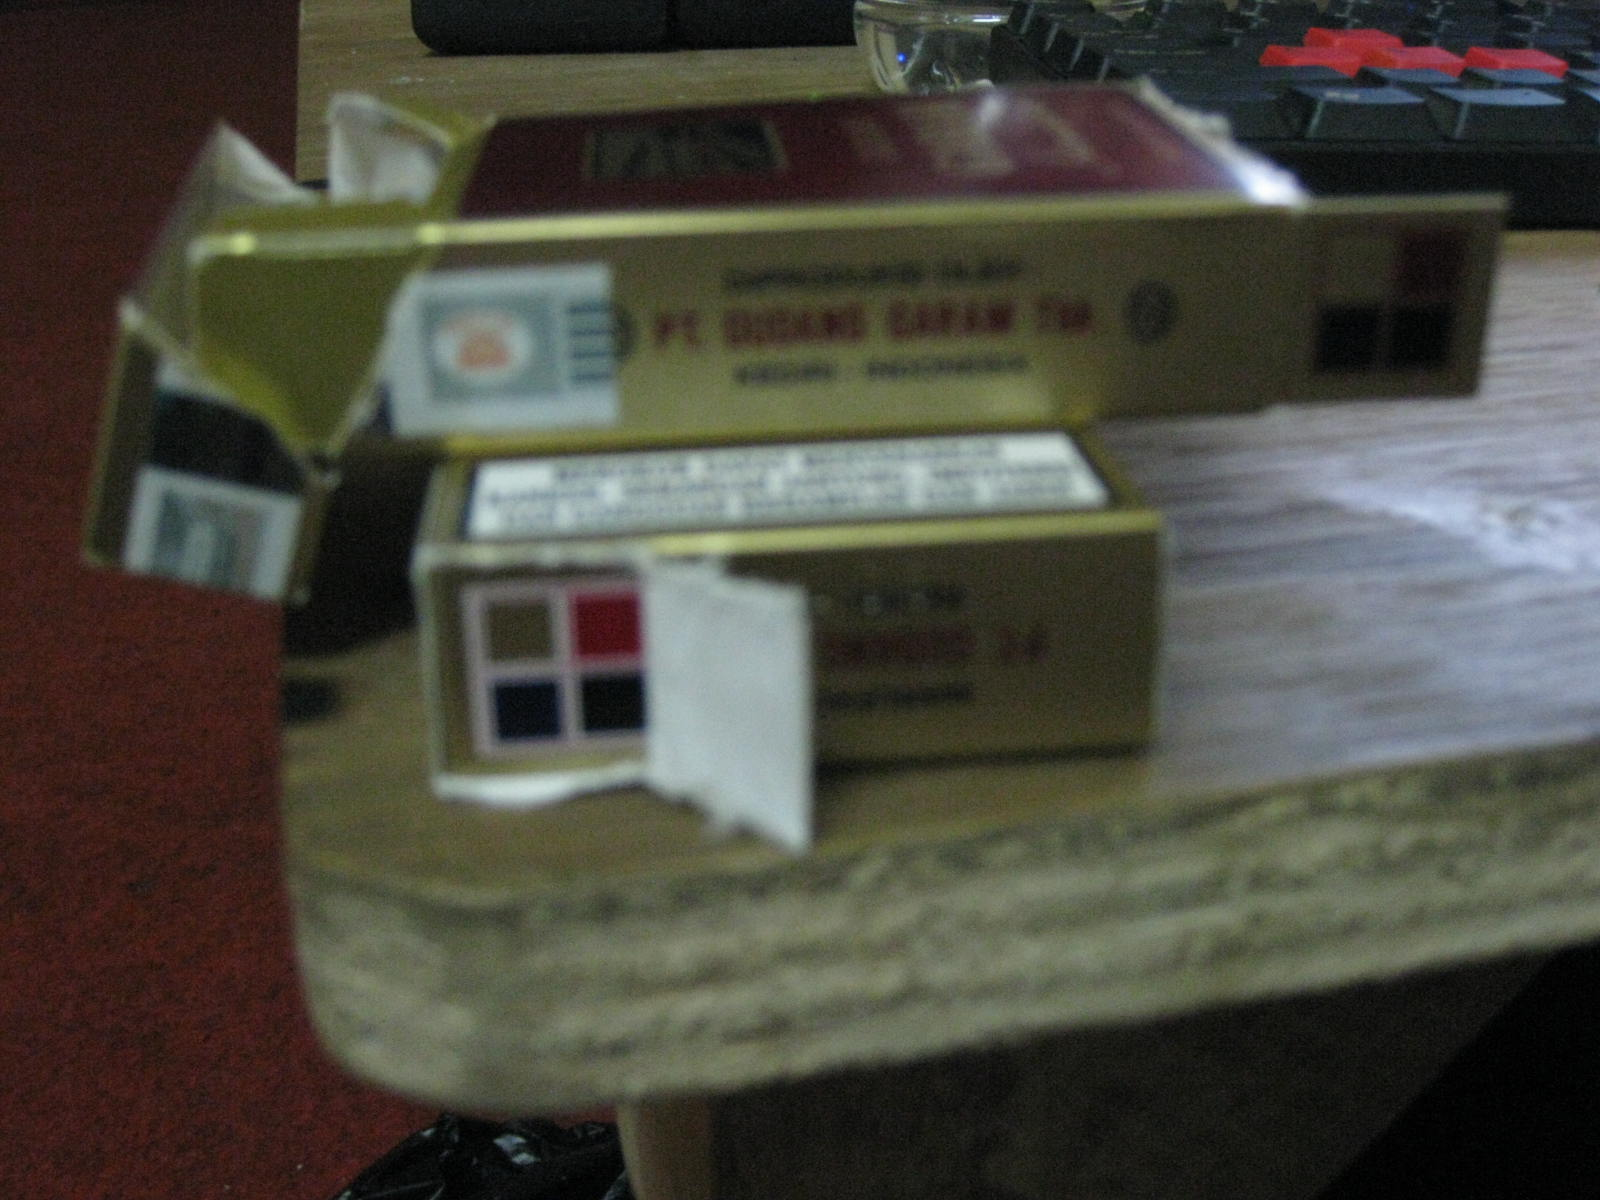 Rahasia Dibalik Bungkus Rokok Gudang Garam Filter Saeful Base Camp Internasional Buat Apa Warna2 Tersebut